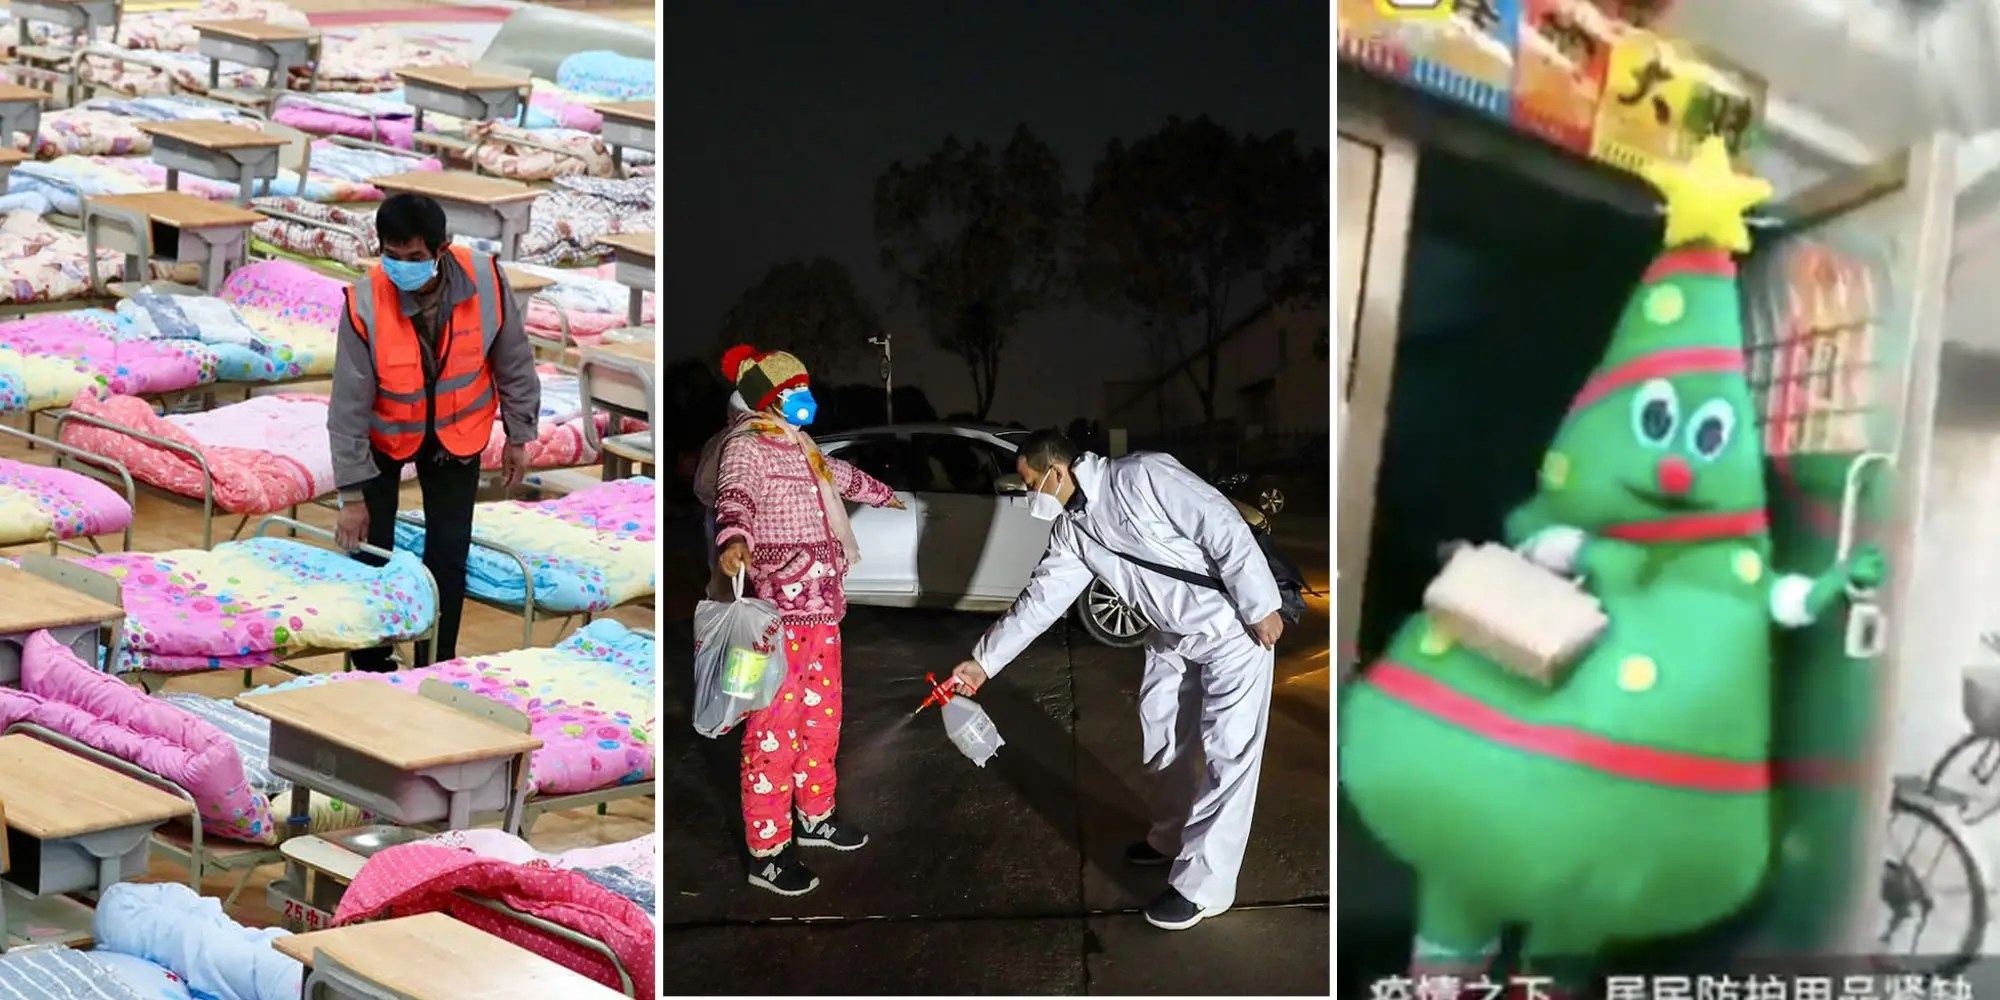 Wuhan coronavirus: What life is like inside quarantined Chinese ...